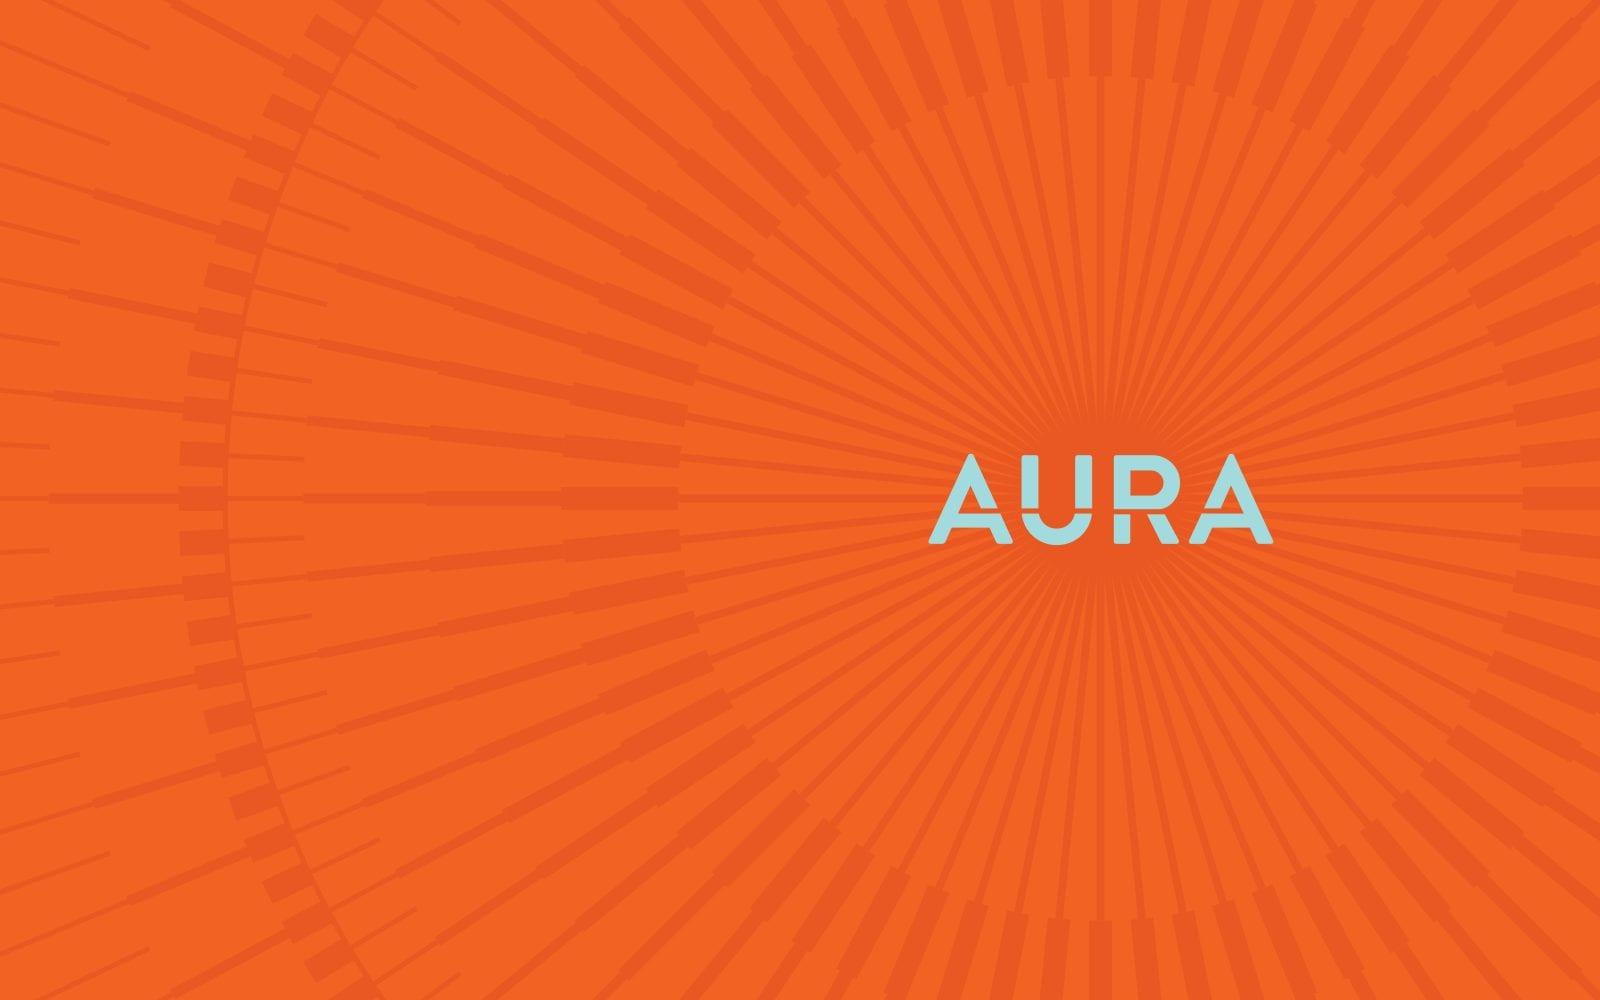 aura holdings logo